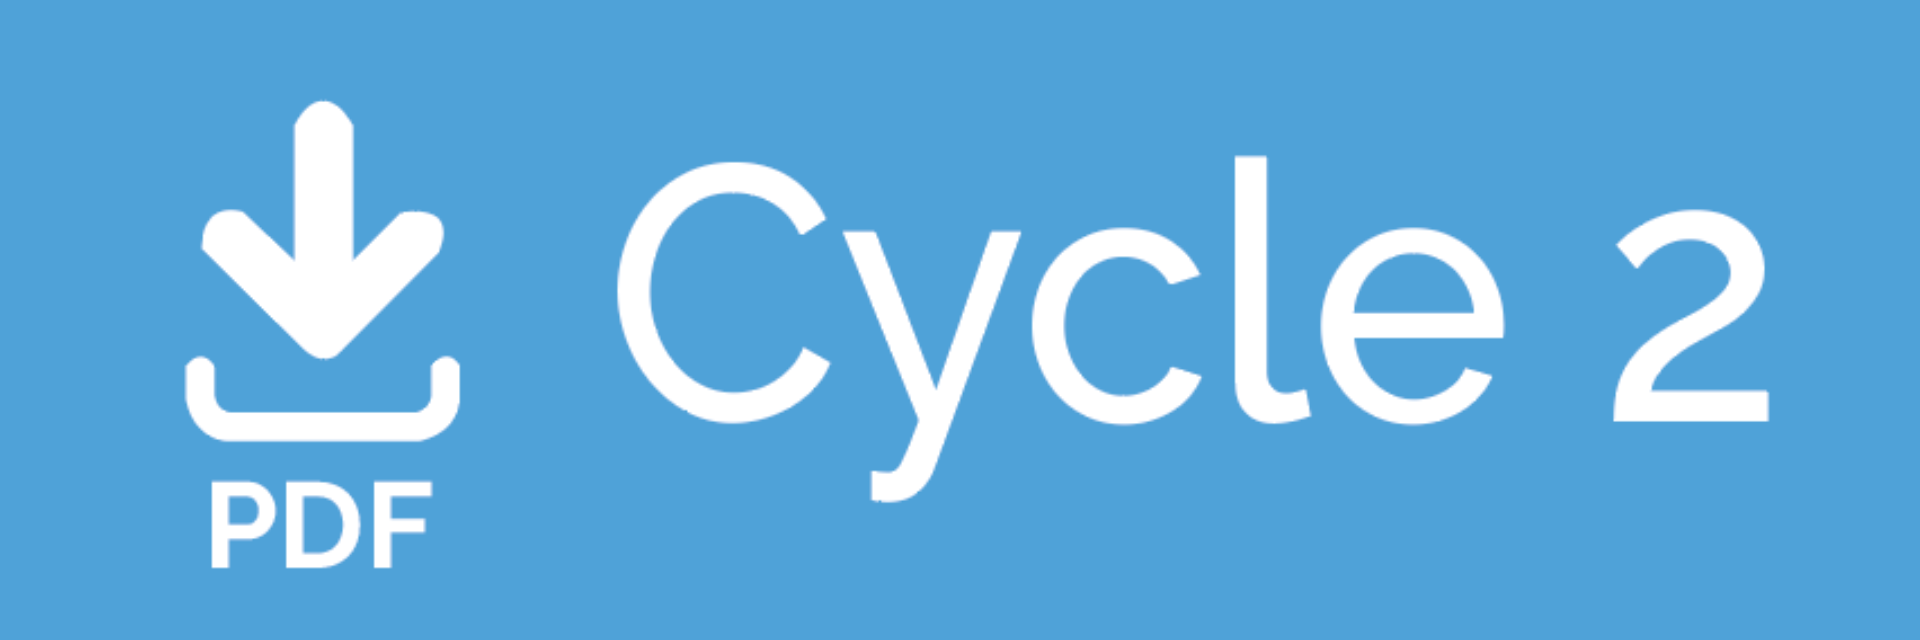 Bouton Cycle 2